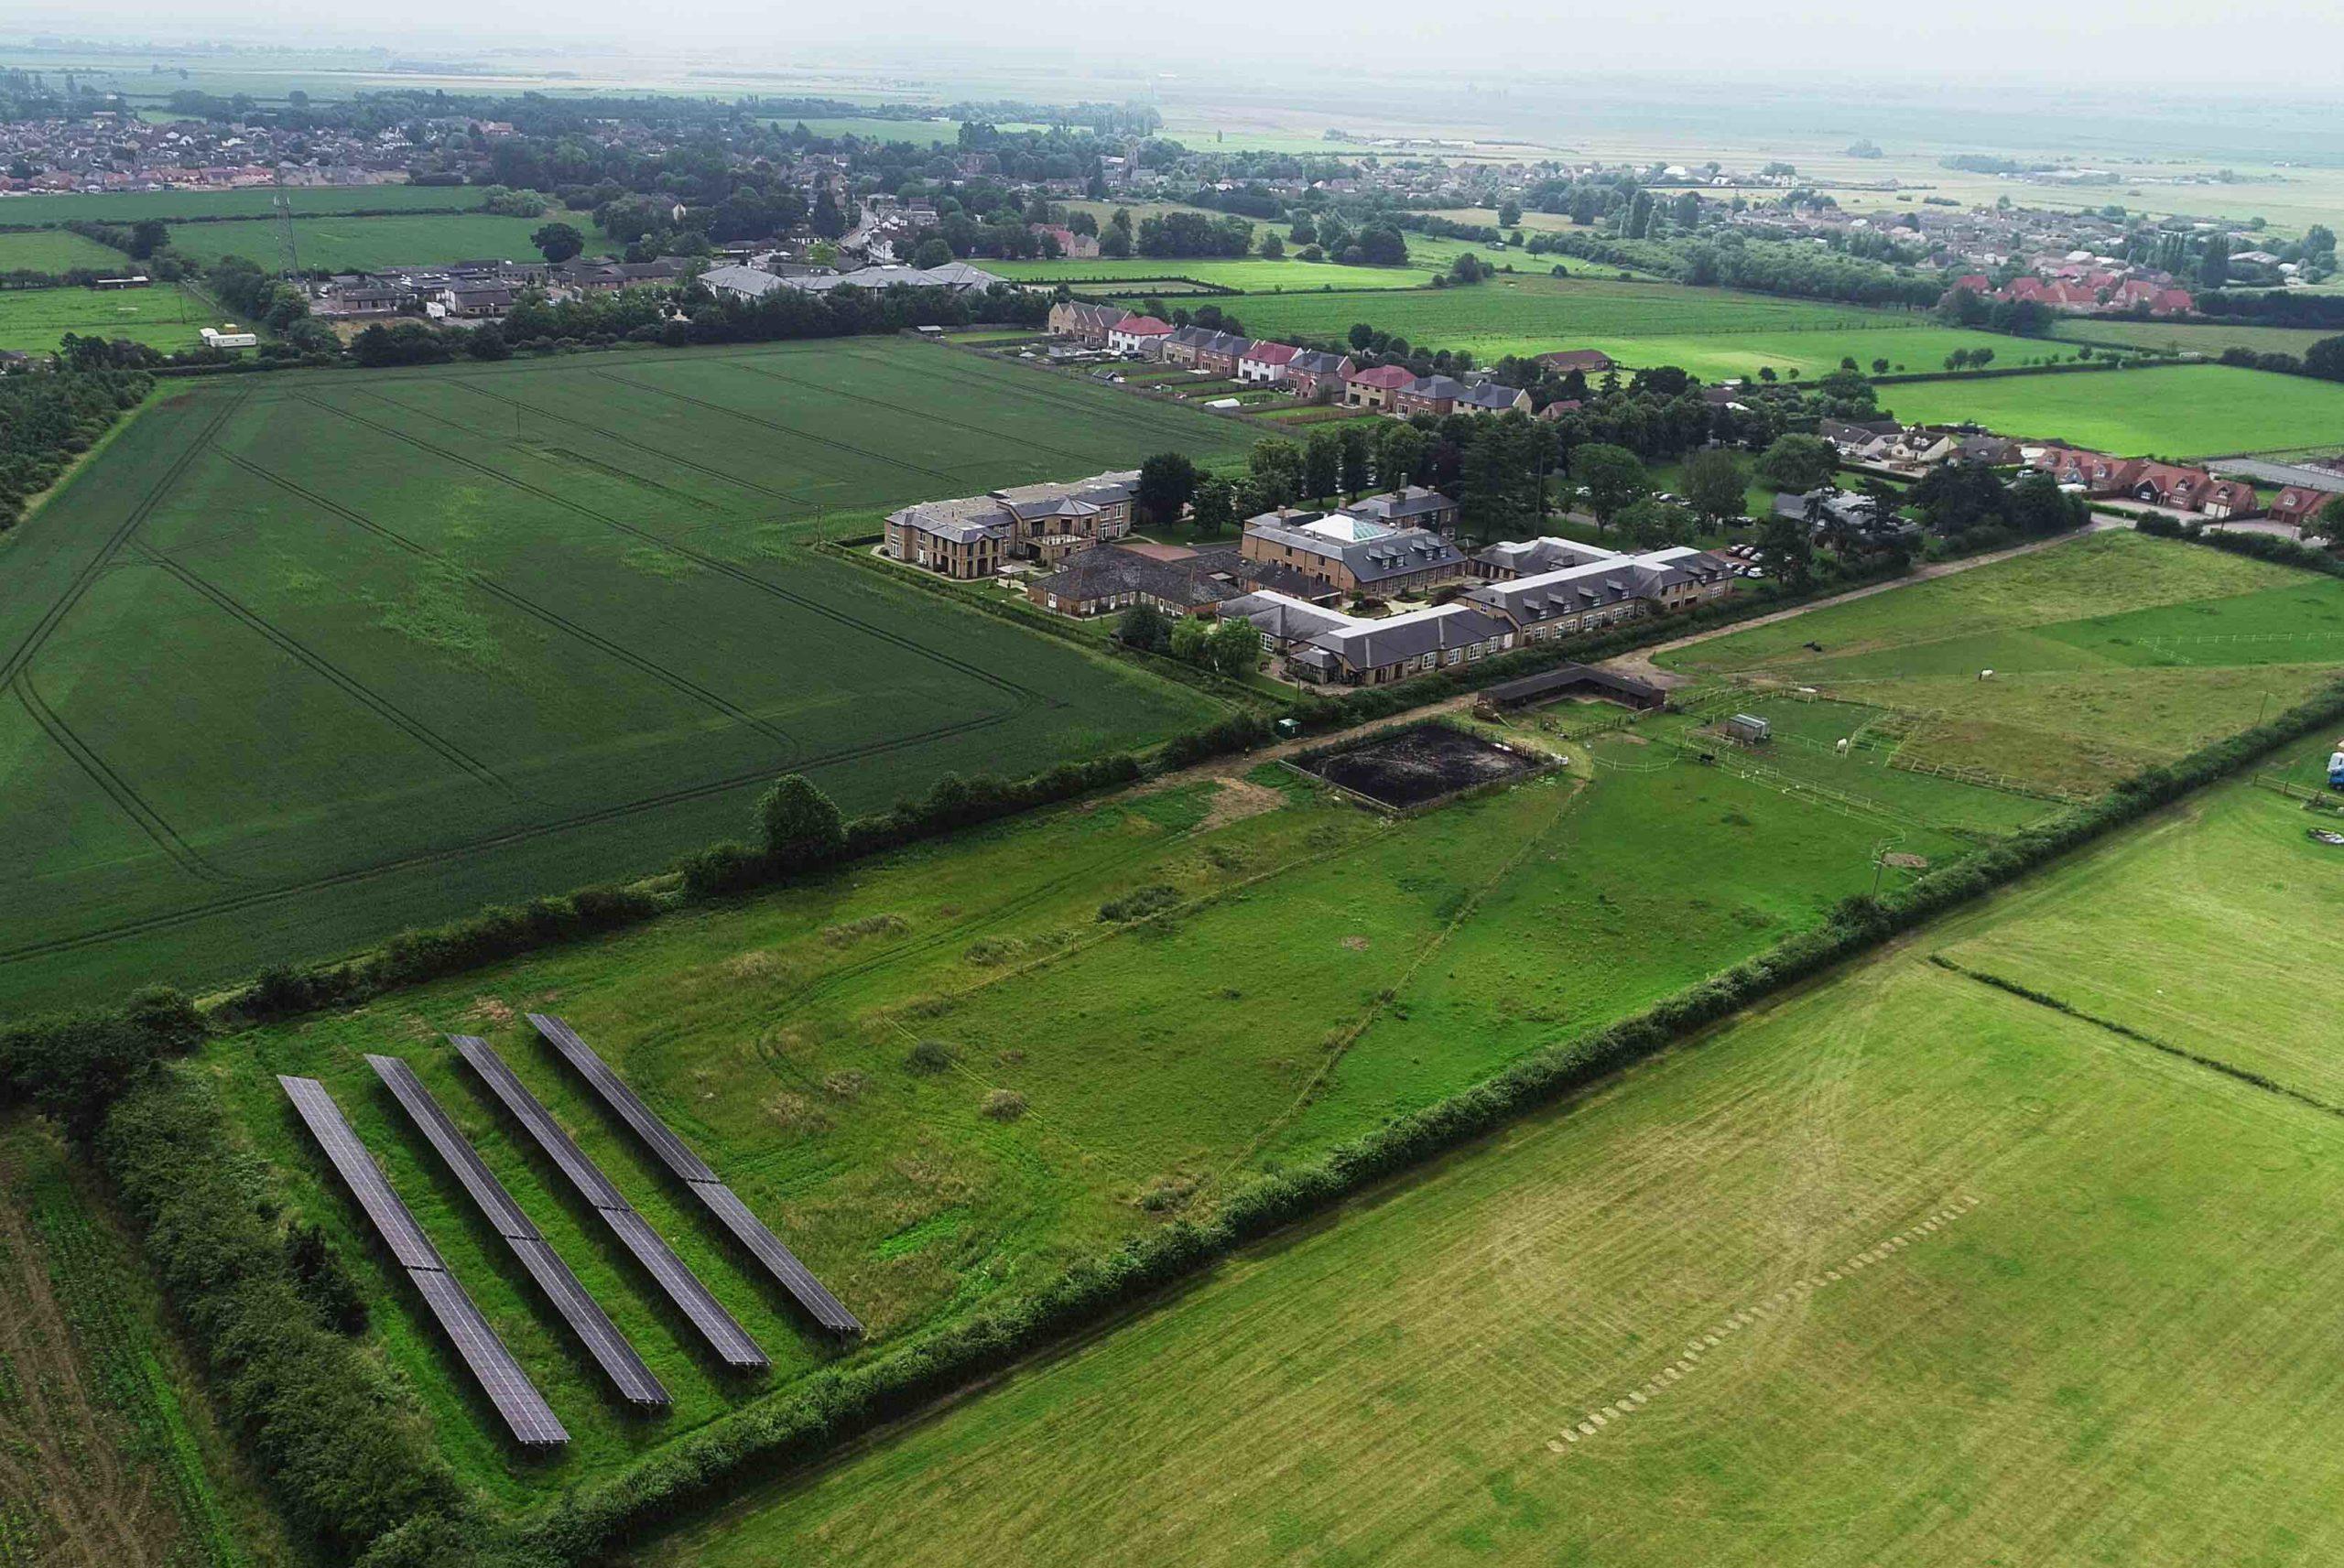 The new solar field at Askham Village Community